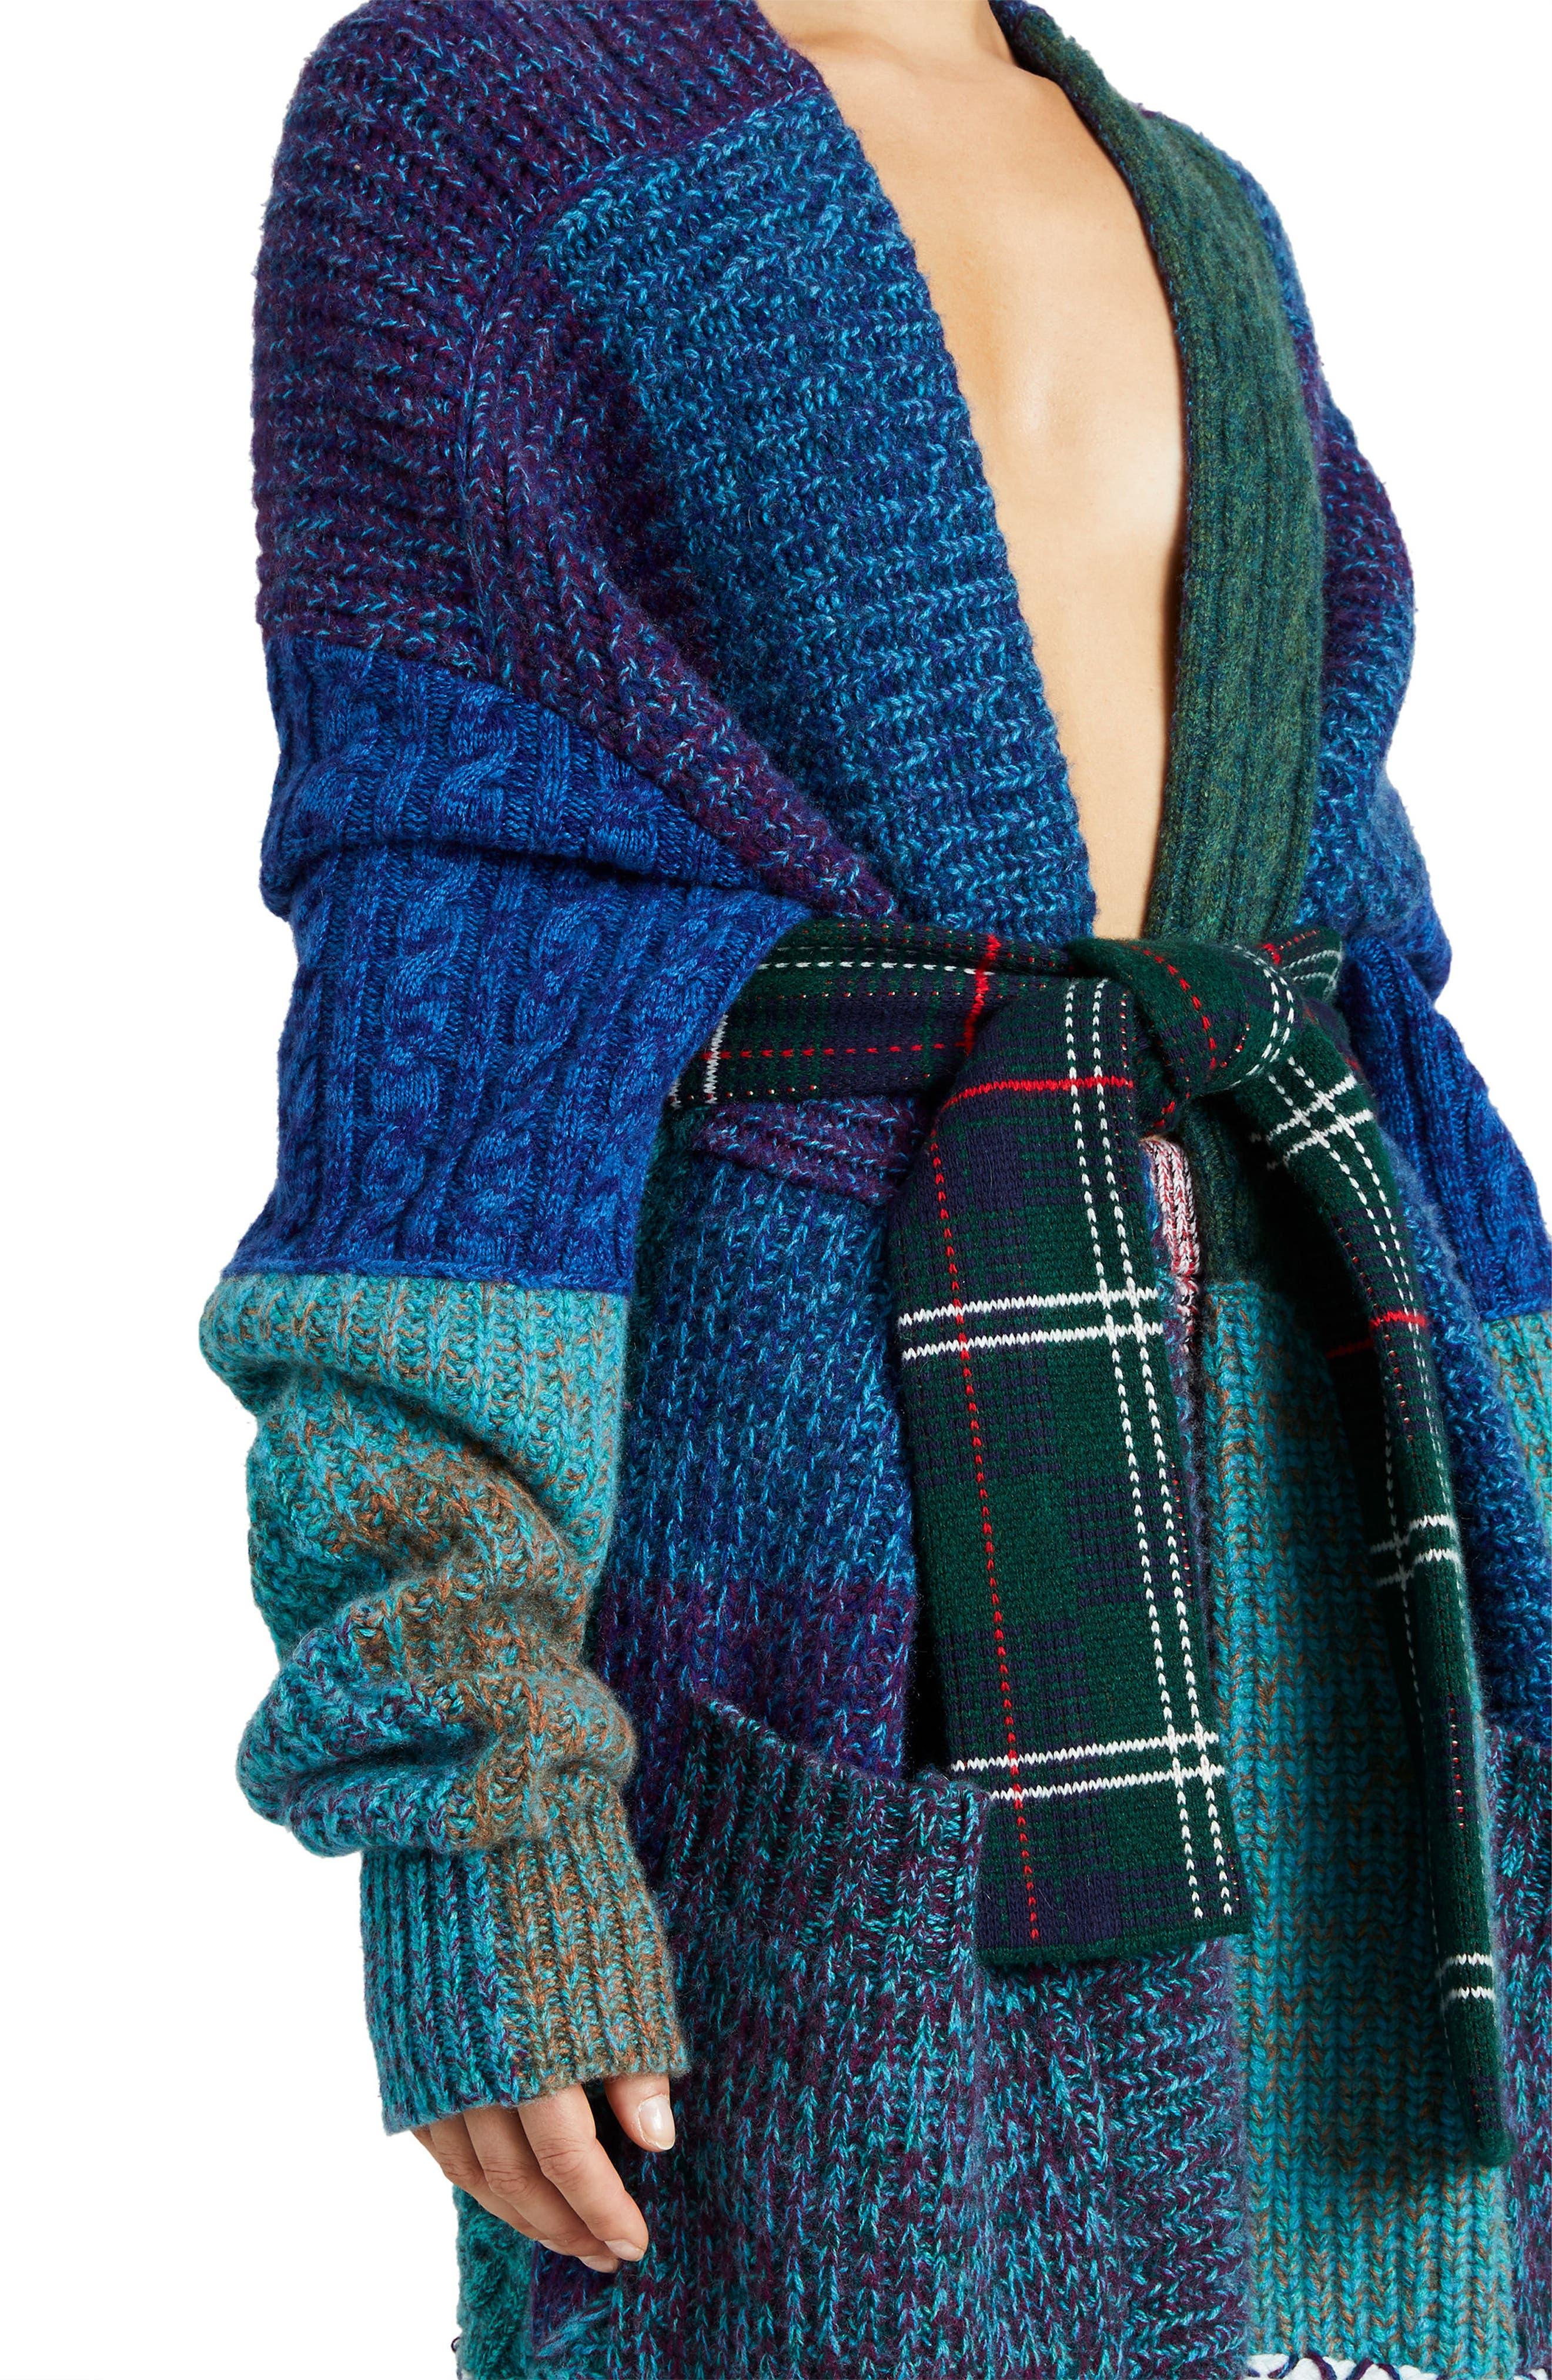 BURBERRY,                             Cashmere & Wool Blend Patchwork Cardigan,                             Alternate thumbnail 3, color,                             437